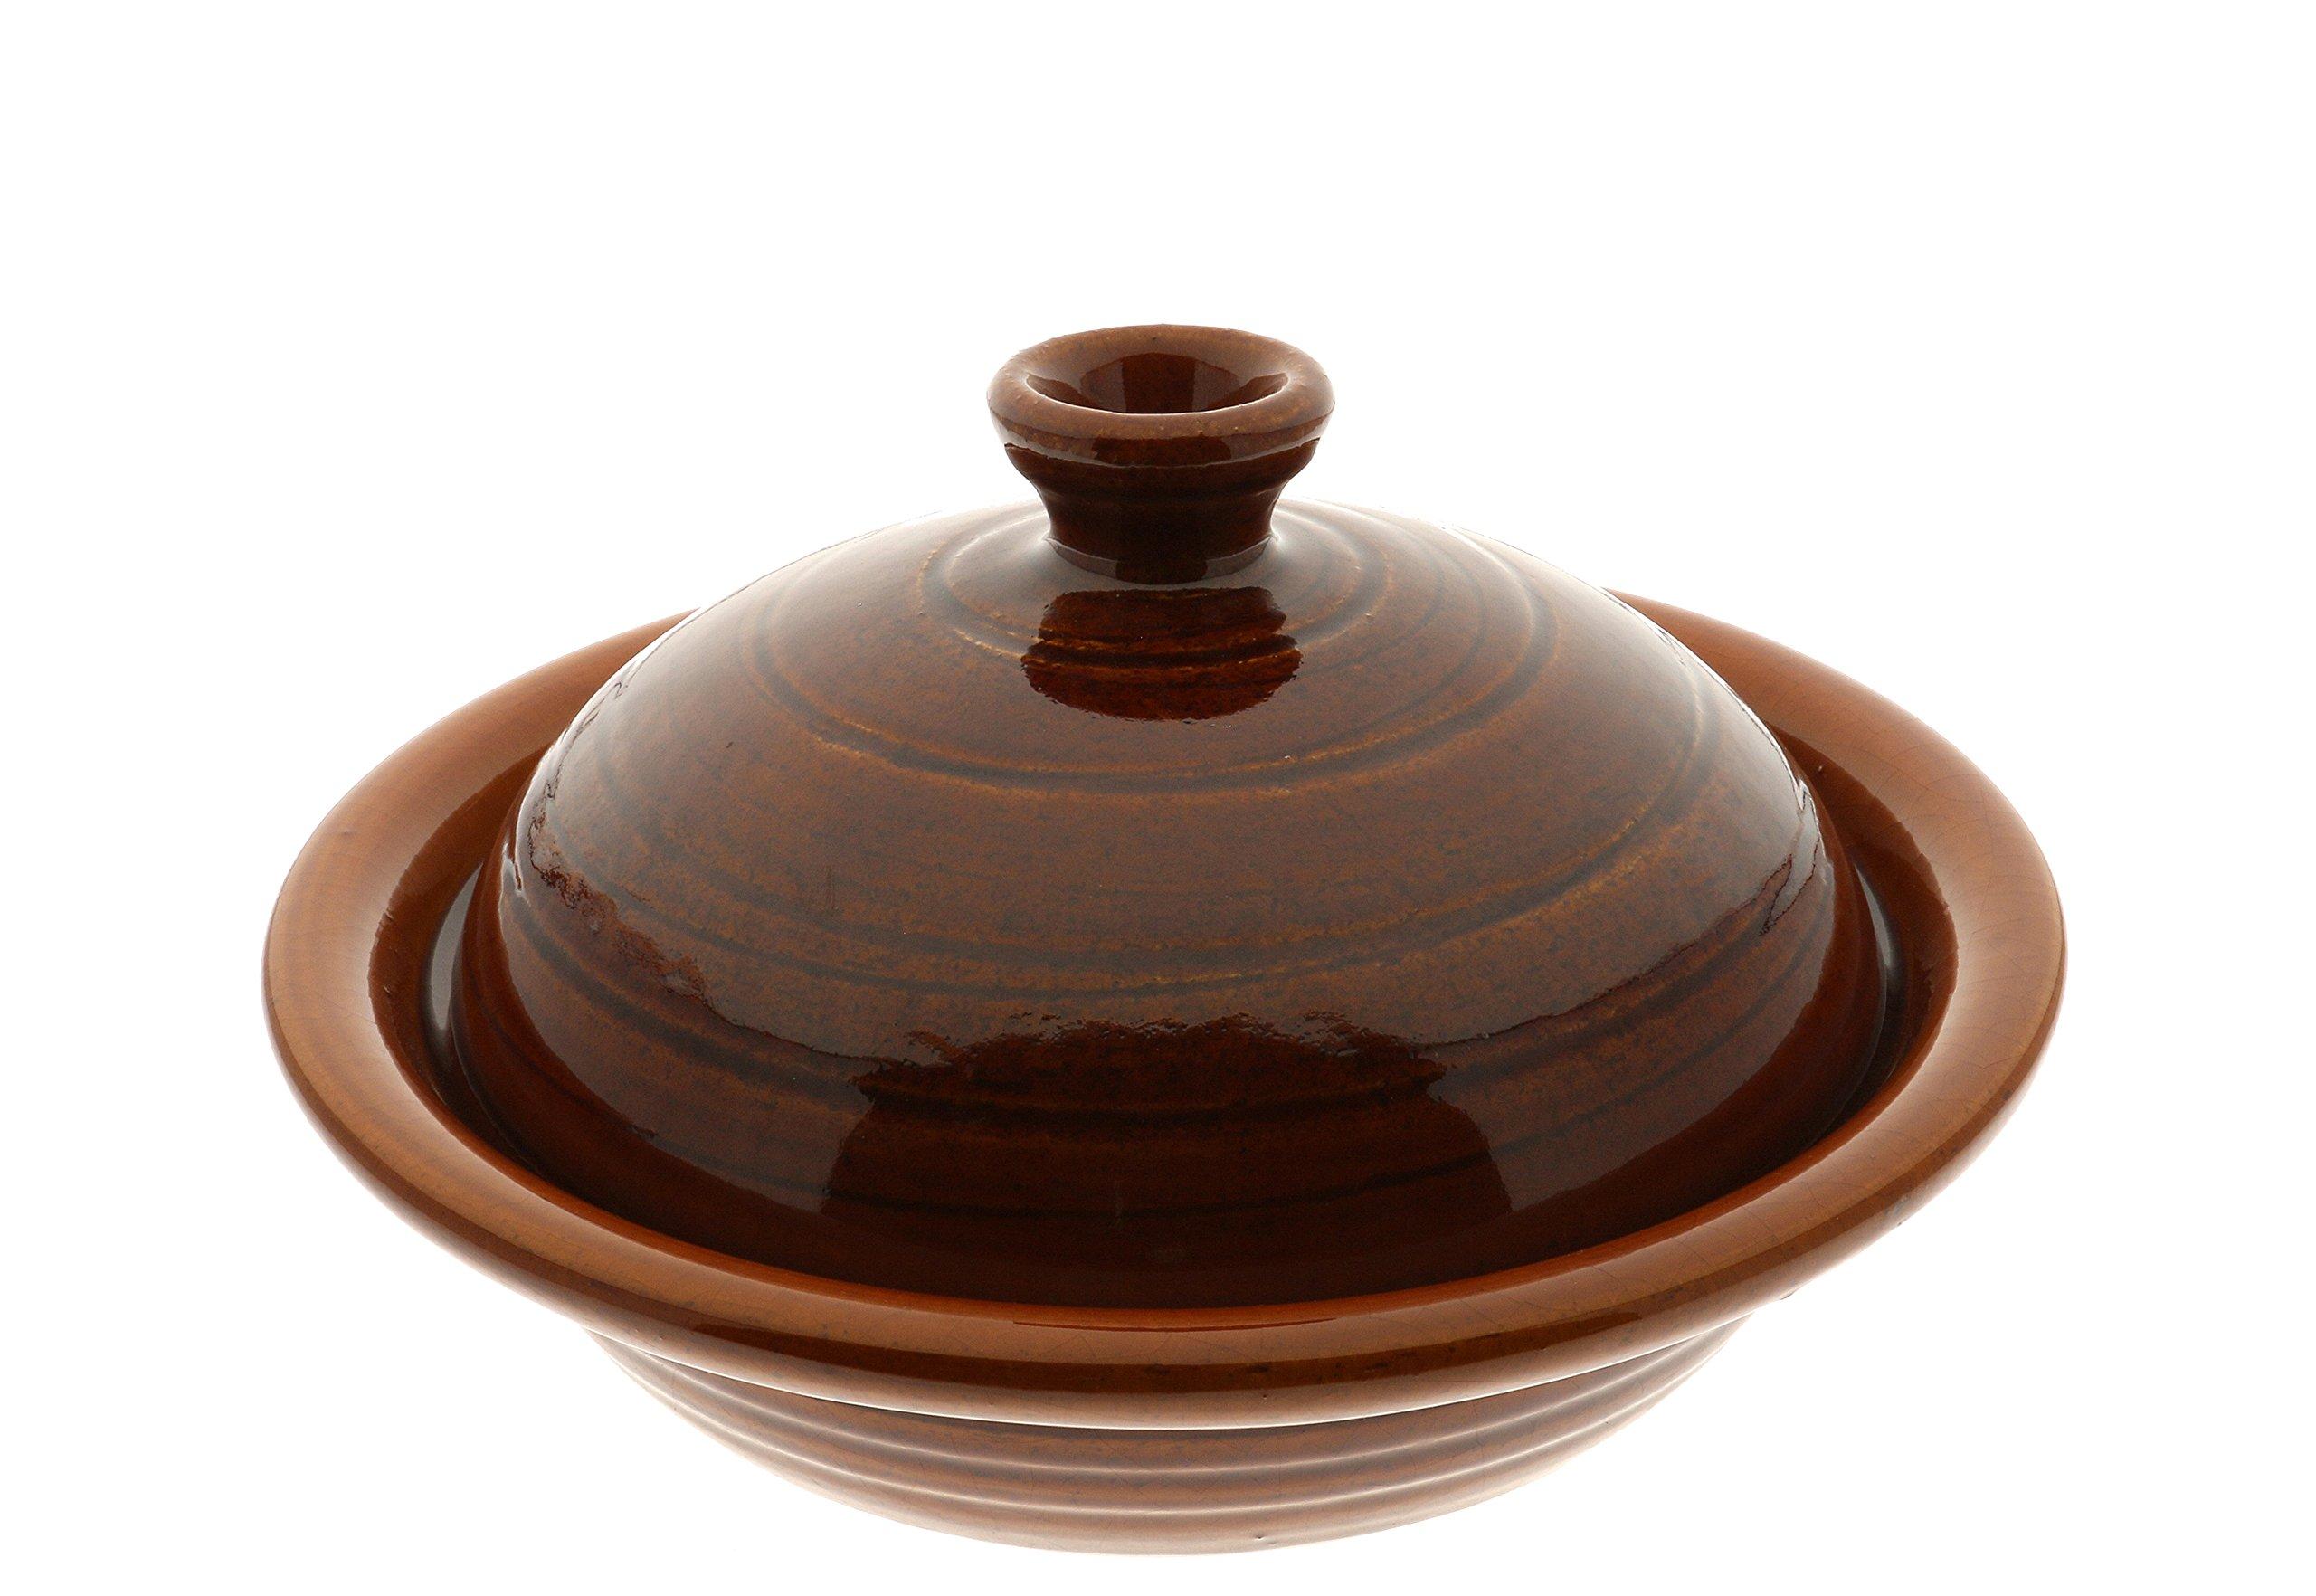 Kotobuki 190-908 Amber Swirl Donabe Japanese Hot Pot, 8-3/4'', Serves 1 to 2